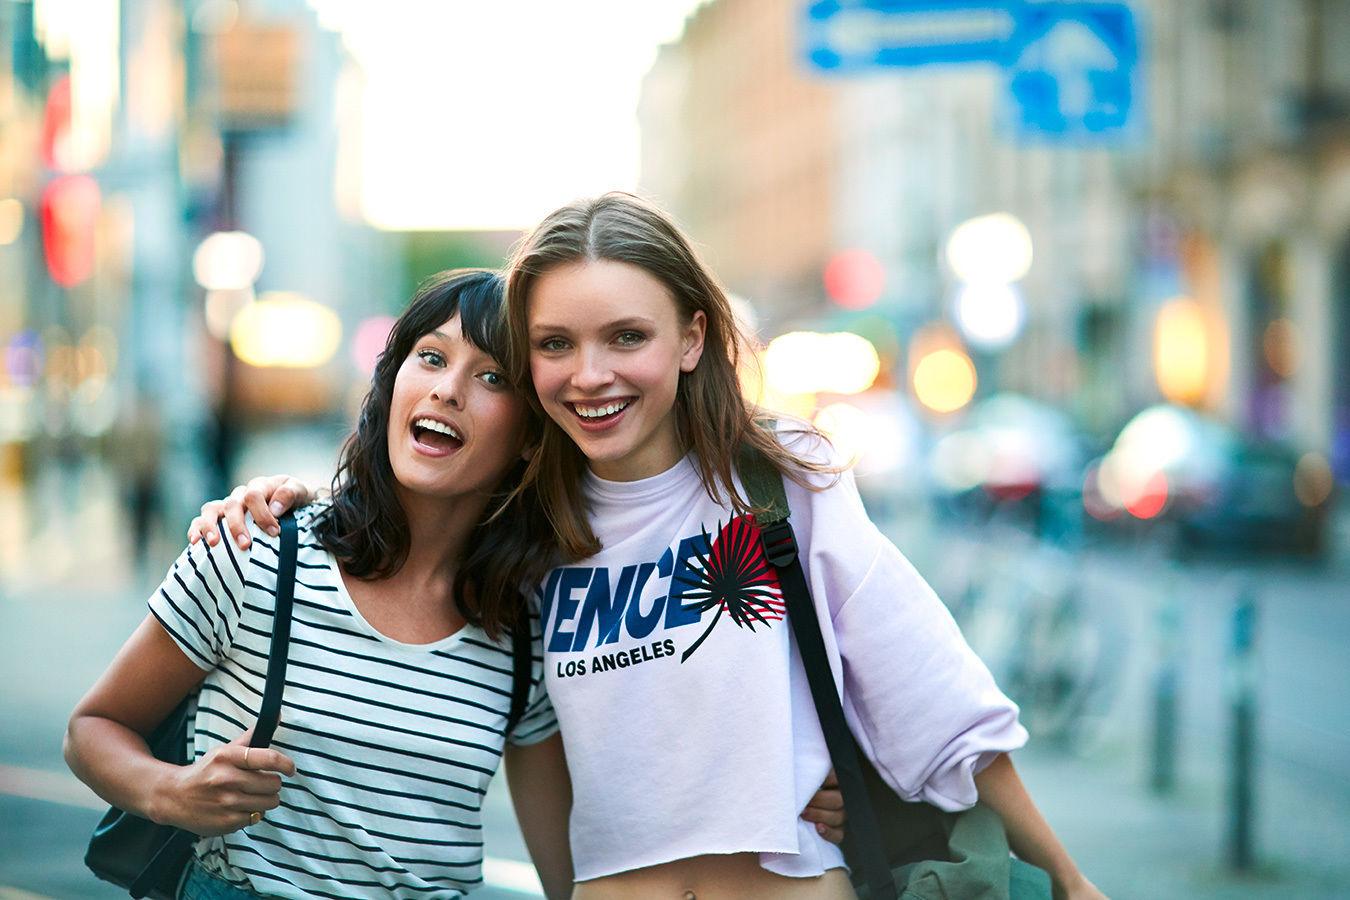 UWE DUETTMANN: 3 Days in Berlin with NIVEA